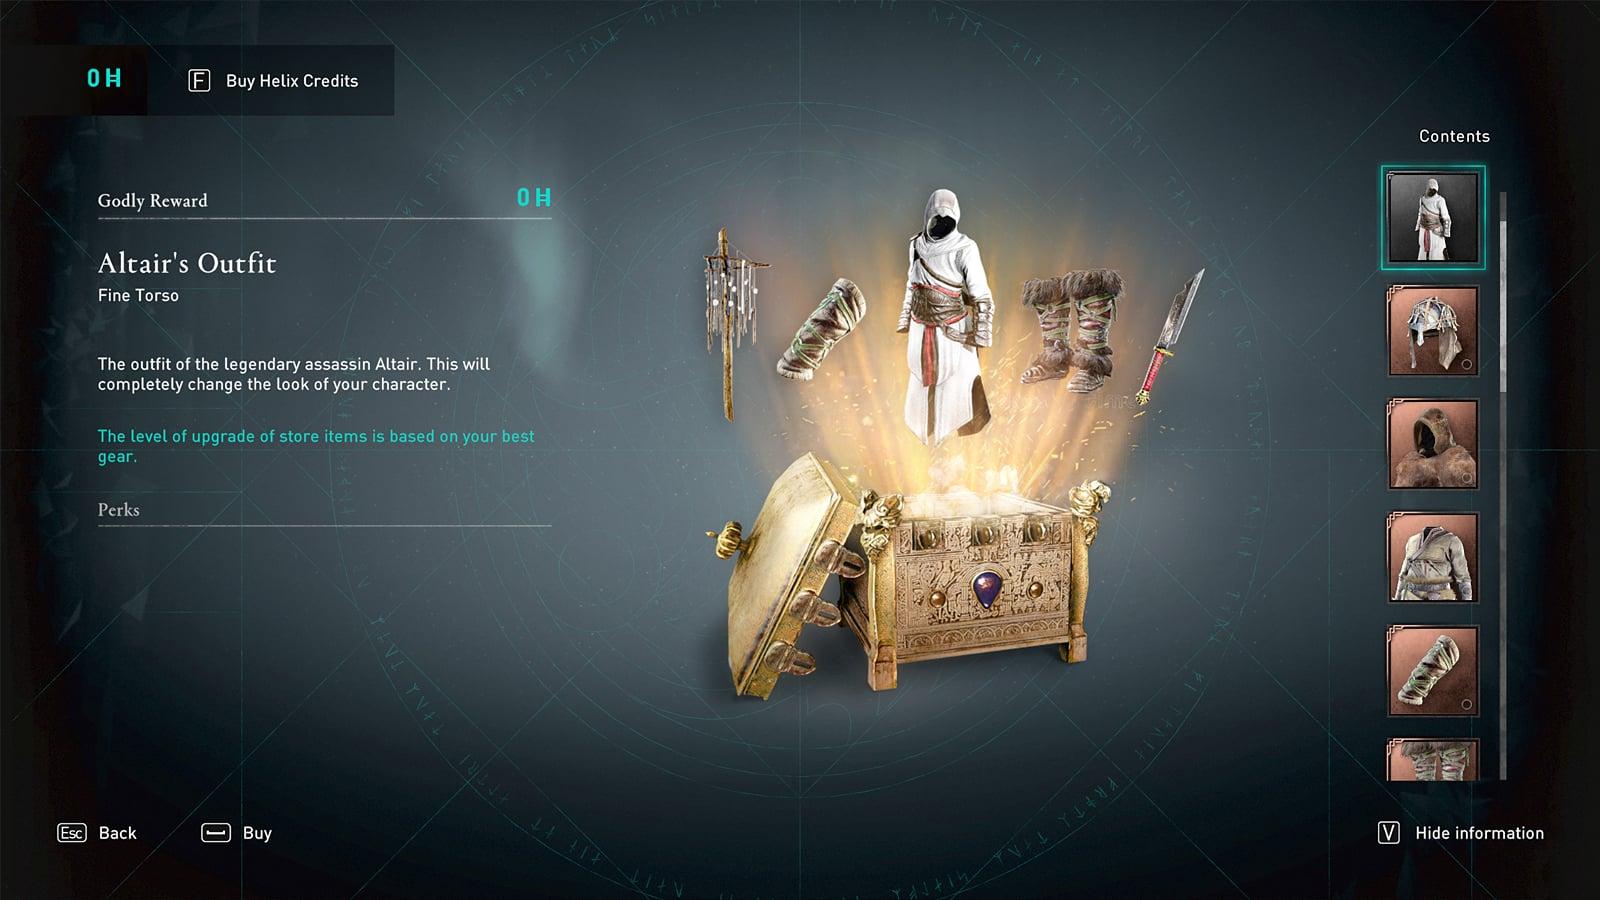 Altair Godly Reward Assassin's Creed Valhalla